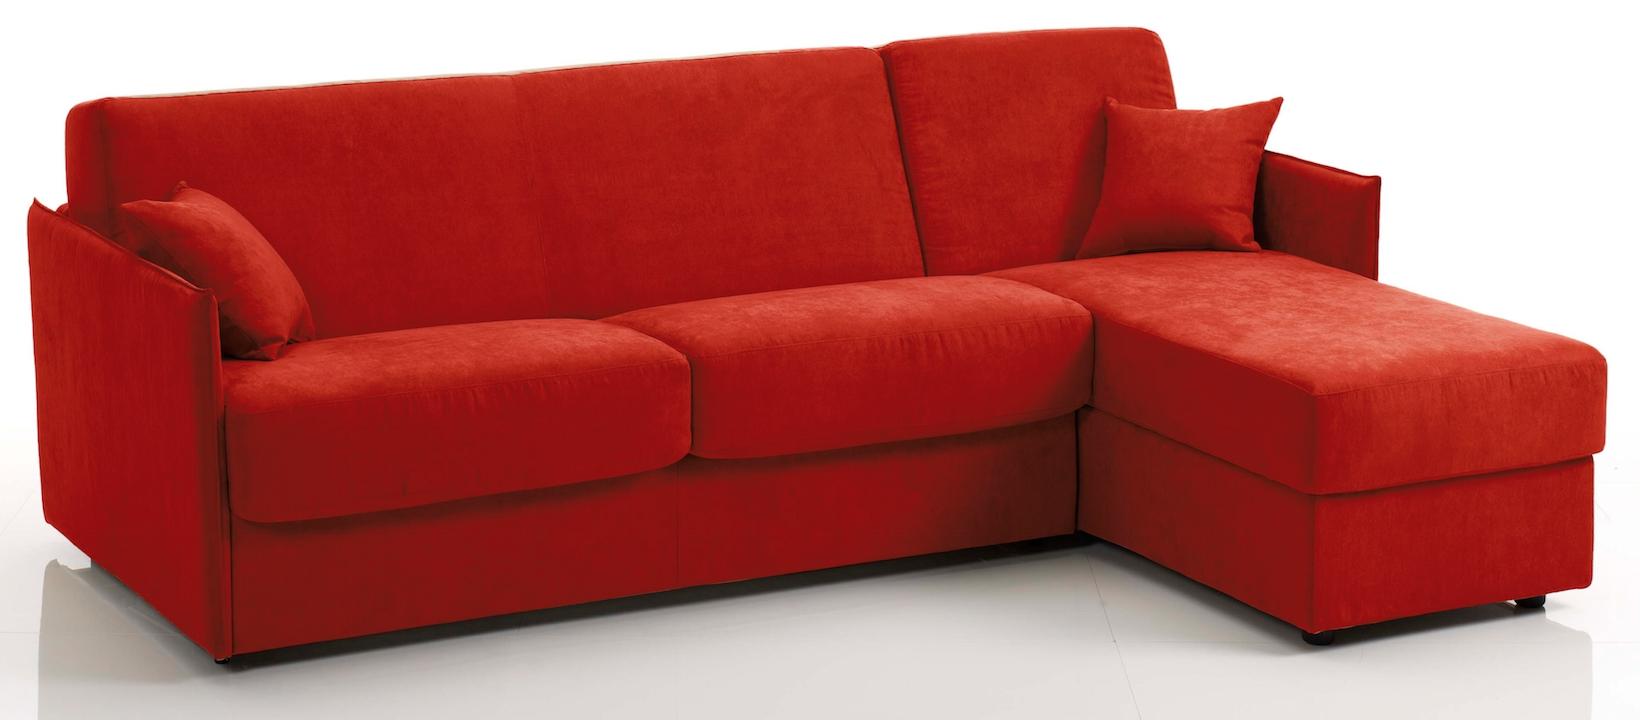 canap d 39 angle convertible bultex tissu rouge swelt. Black Bedroom Furniture Sets. Home Design Ideas